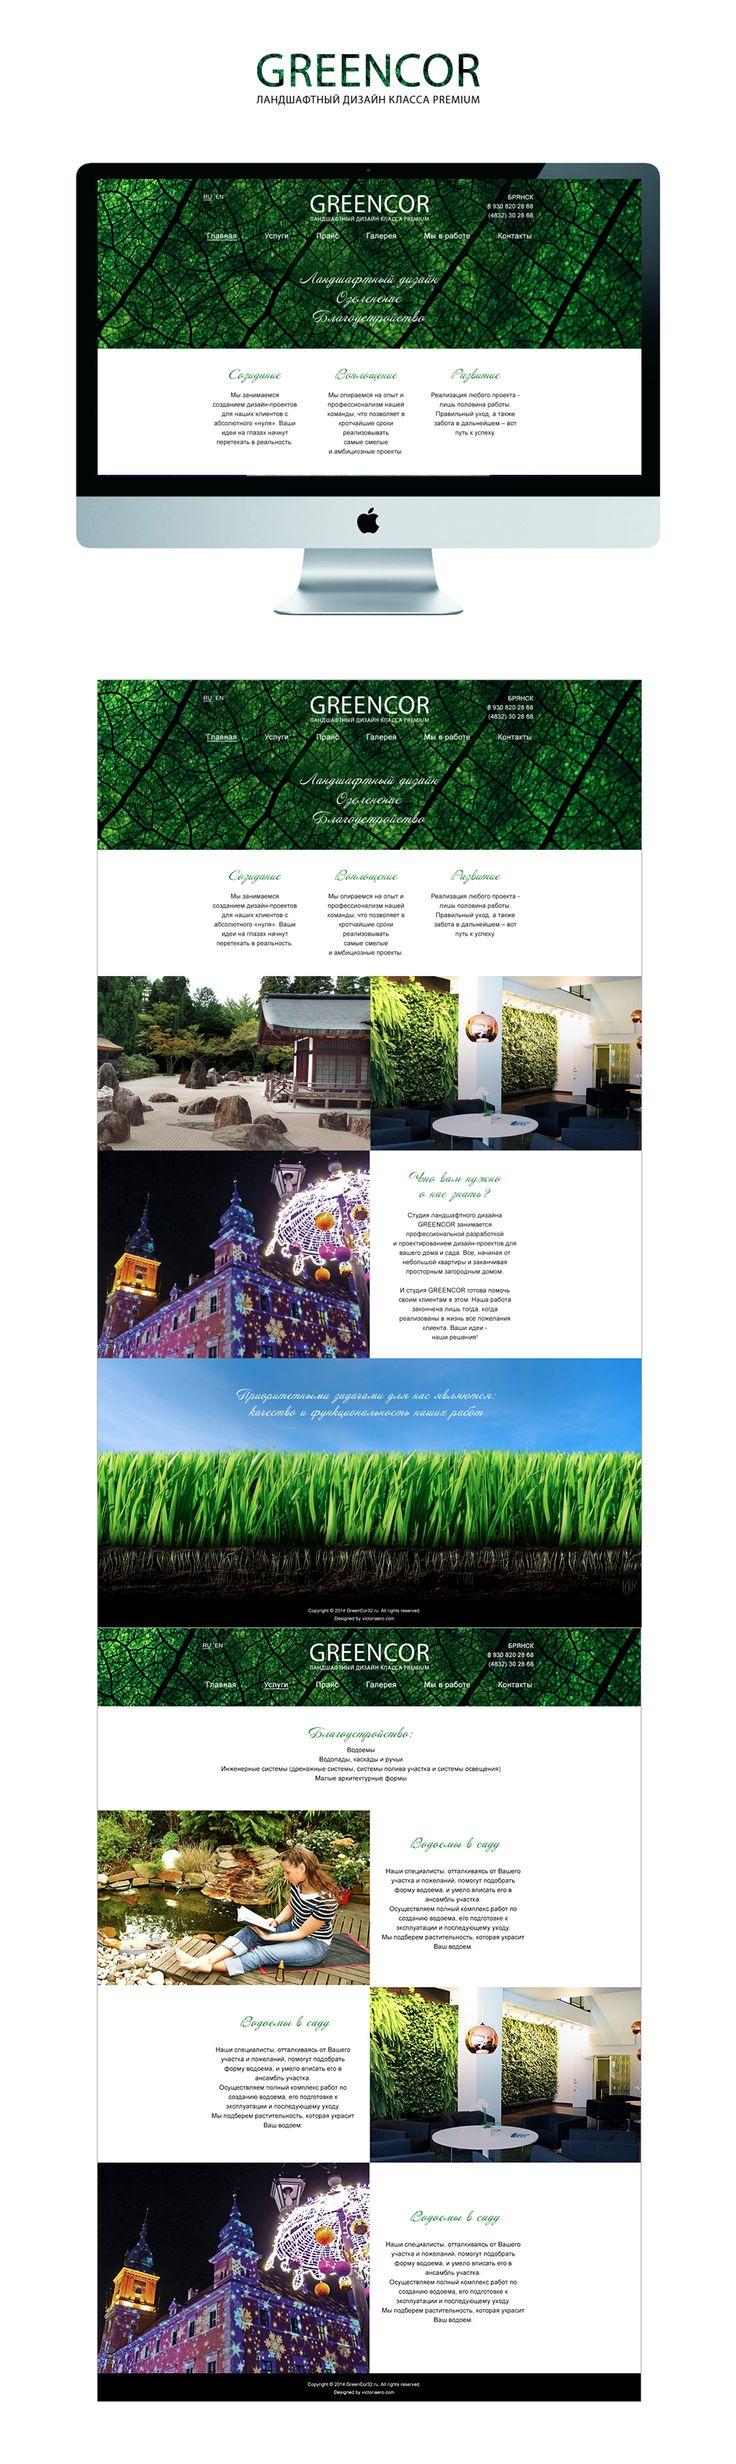 Сайт компании GreenCor - Разработка логотипа и корпоративного сайта для компании по ландшафтному дизайну GreenCor